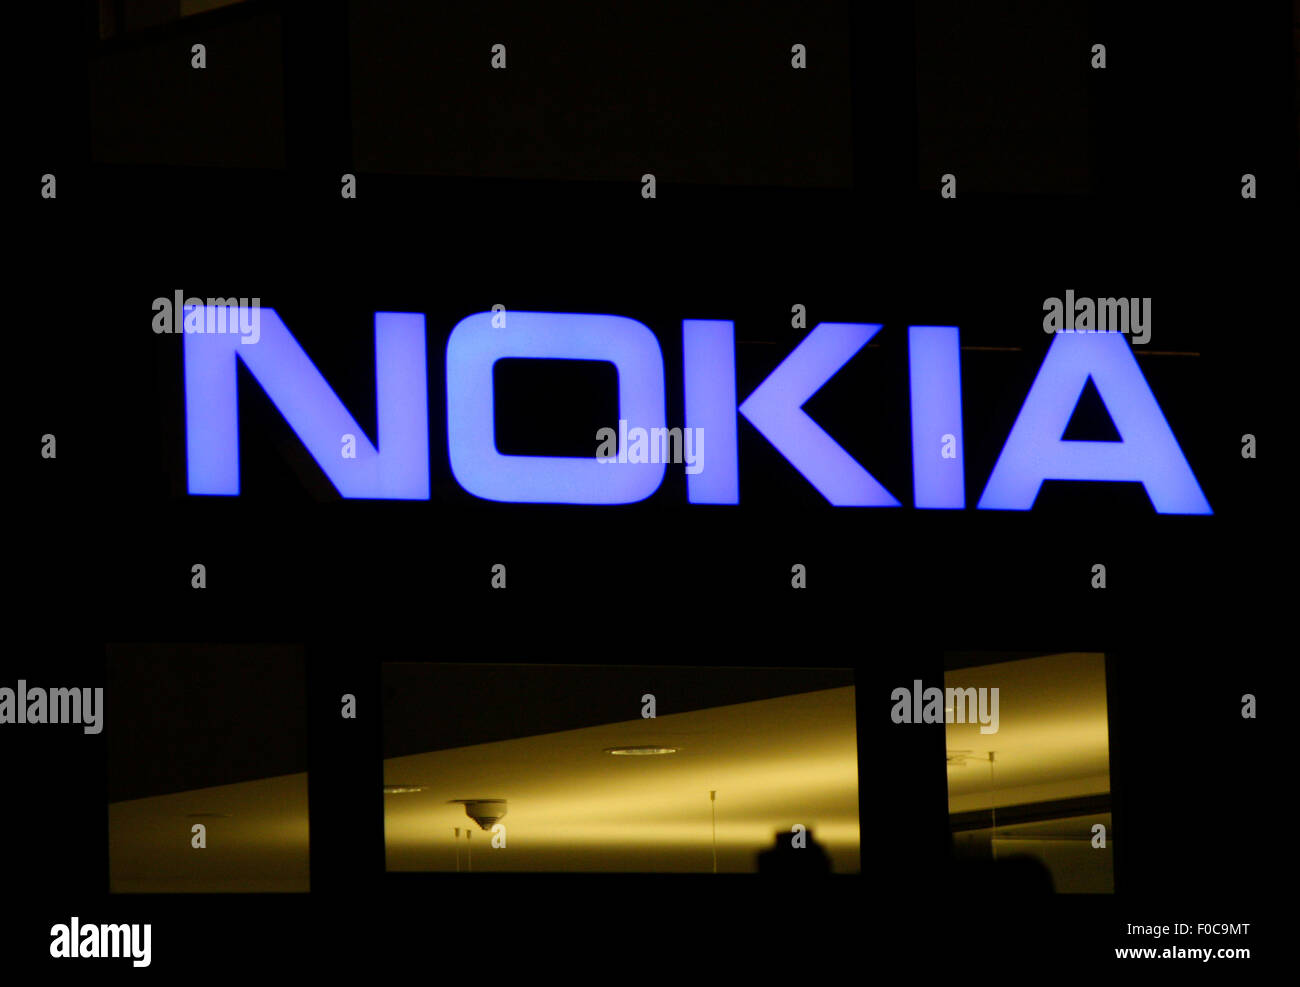 Markenname: 'Nokia', Dezember 2013, Berlin. - Stock Image